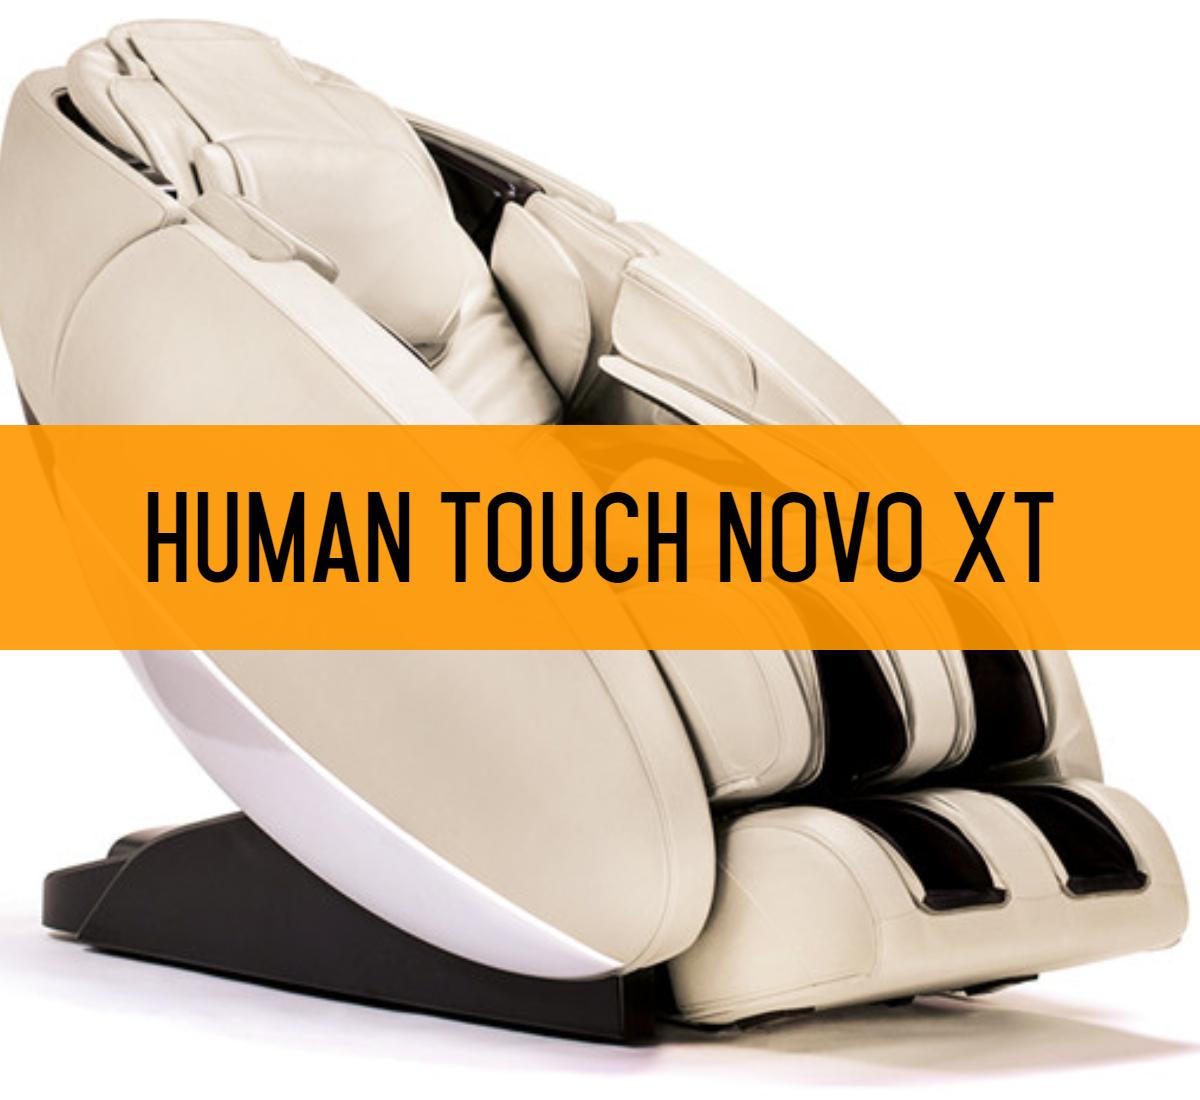 Human Touch Novo XT